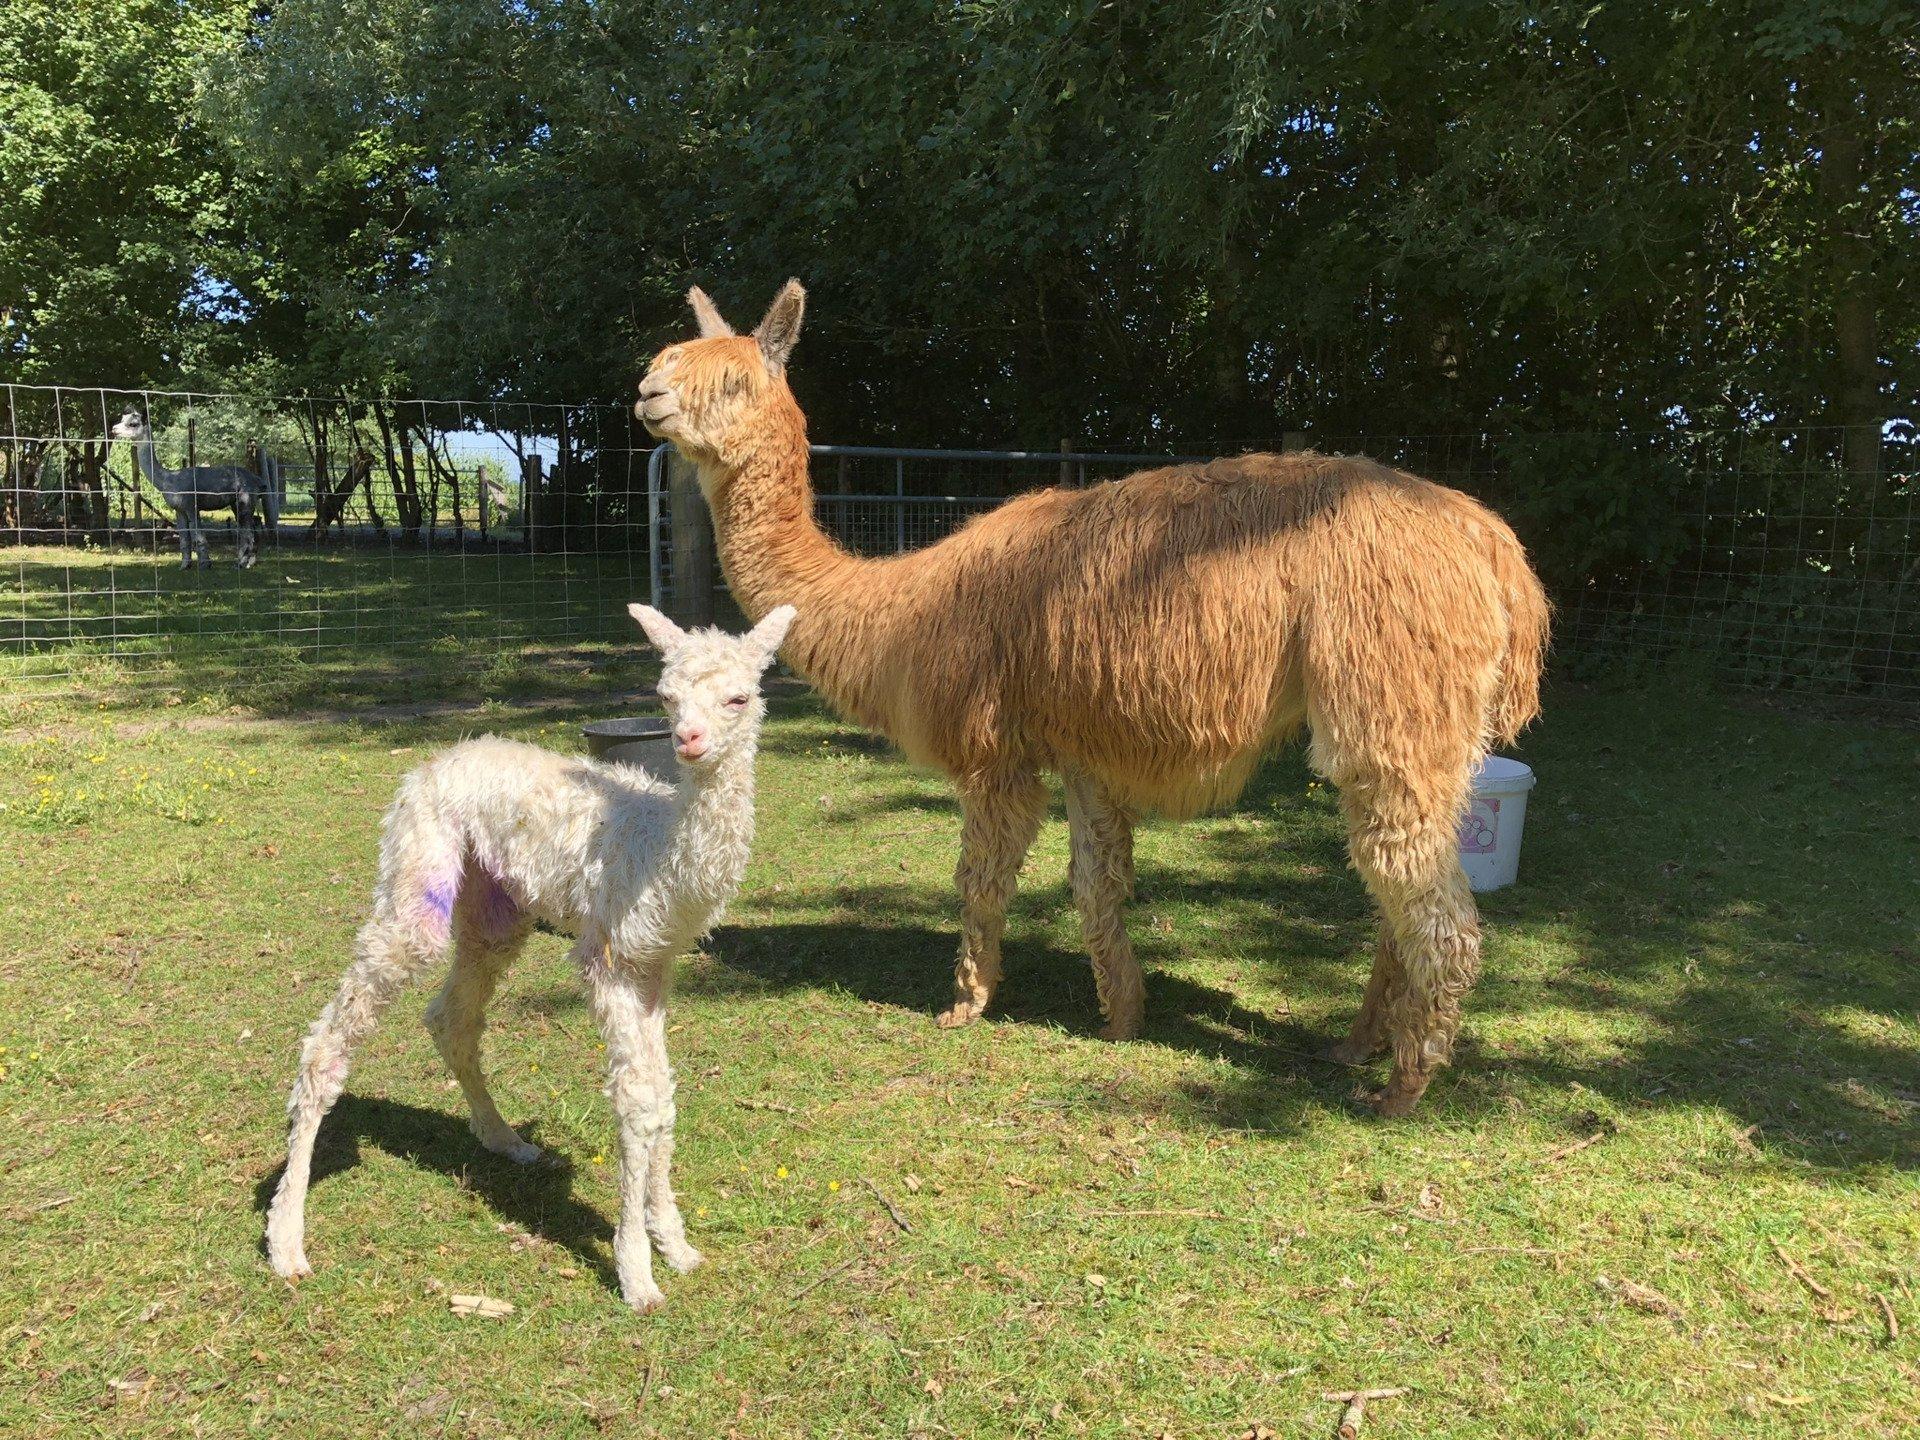 AE Nicolette — aangeboden door Alpaca & Falabella Ranch Rzadkiewa